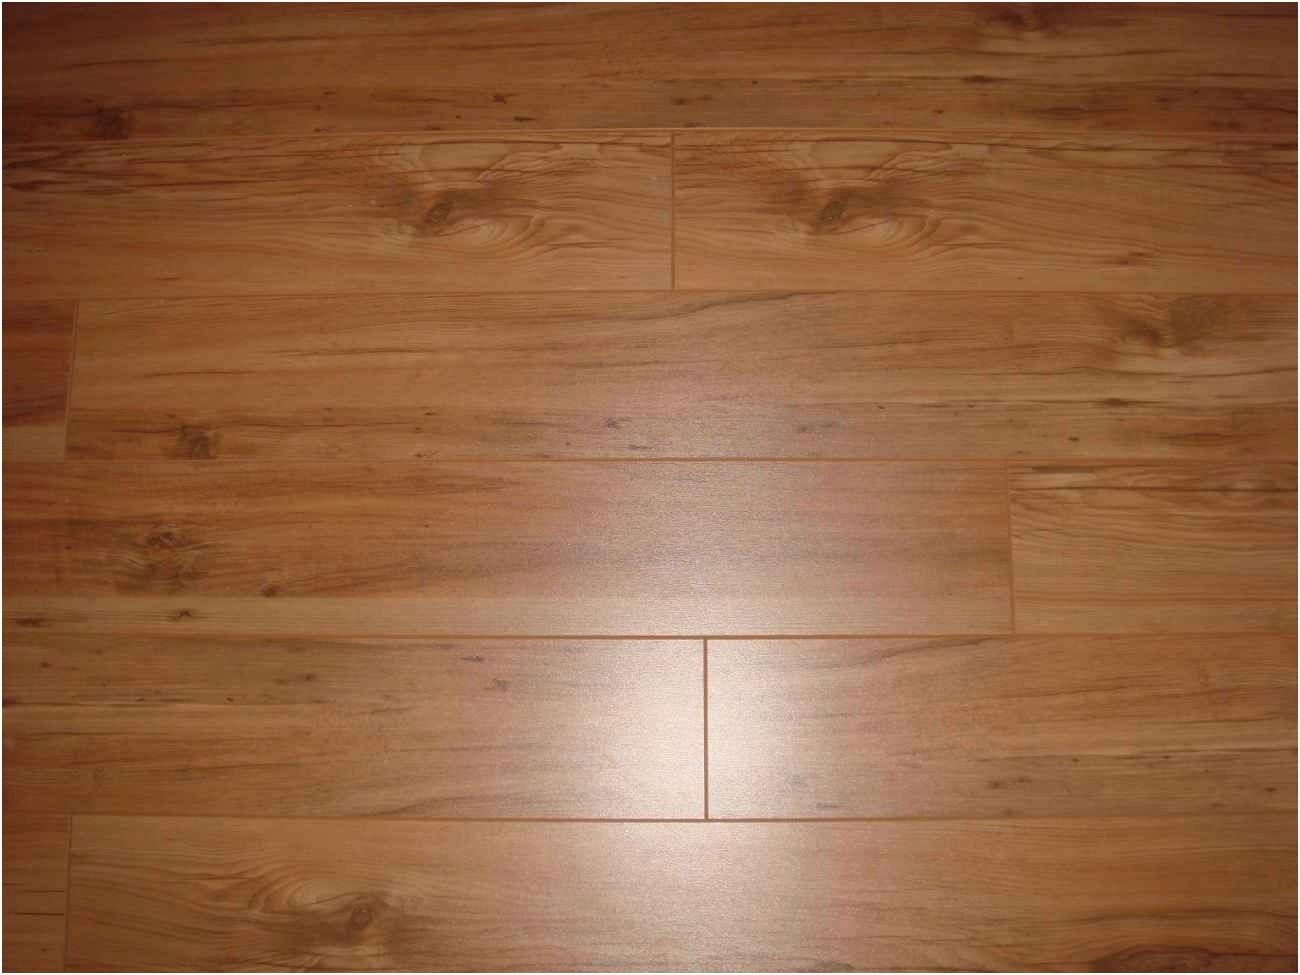 29 Famous Lm Engineered Hardwood Flooring Reviews 2021 free download lm engineered hardwood flooring reviews of ceramic tile vs hardwood flooring flooring ideas for ceramic tile flooring that looks like wood extraordinay hardwood over galerie